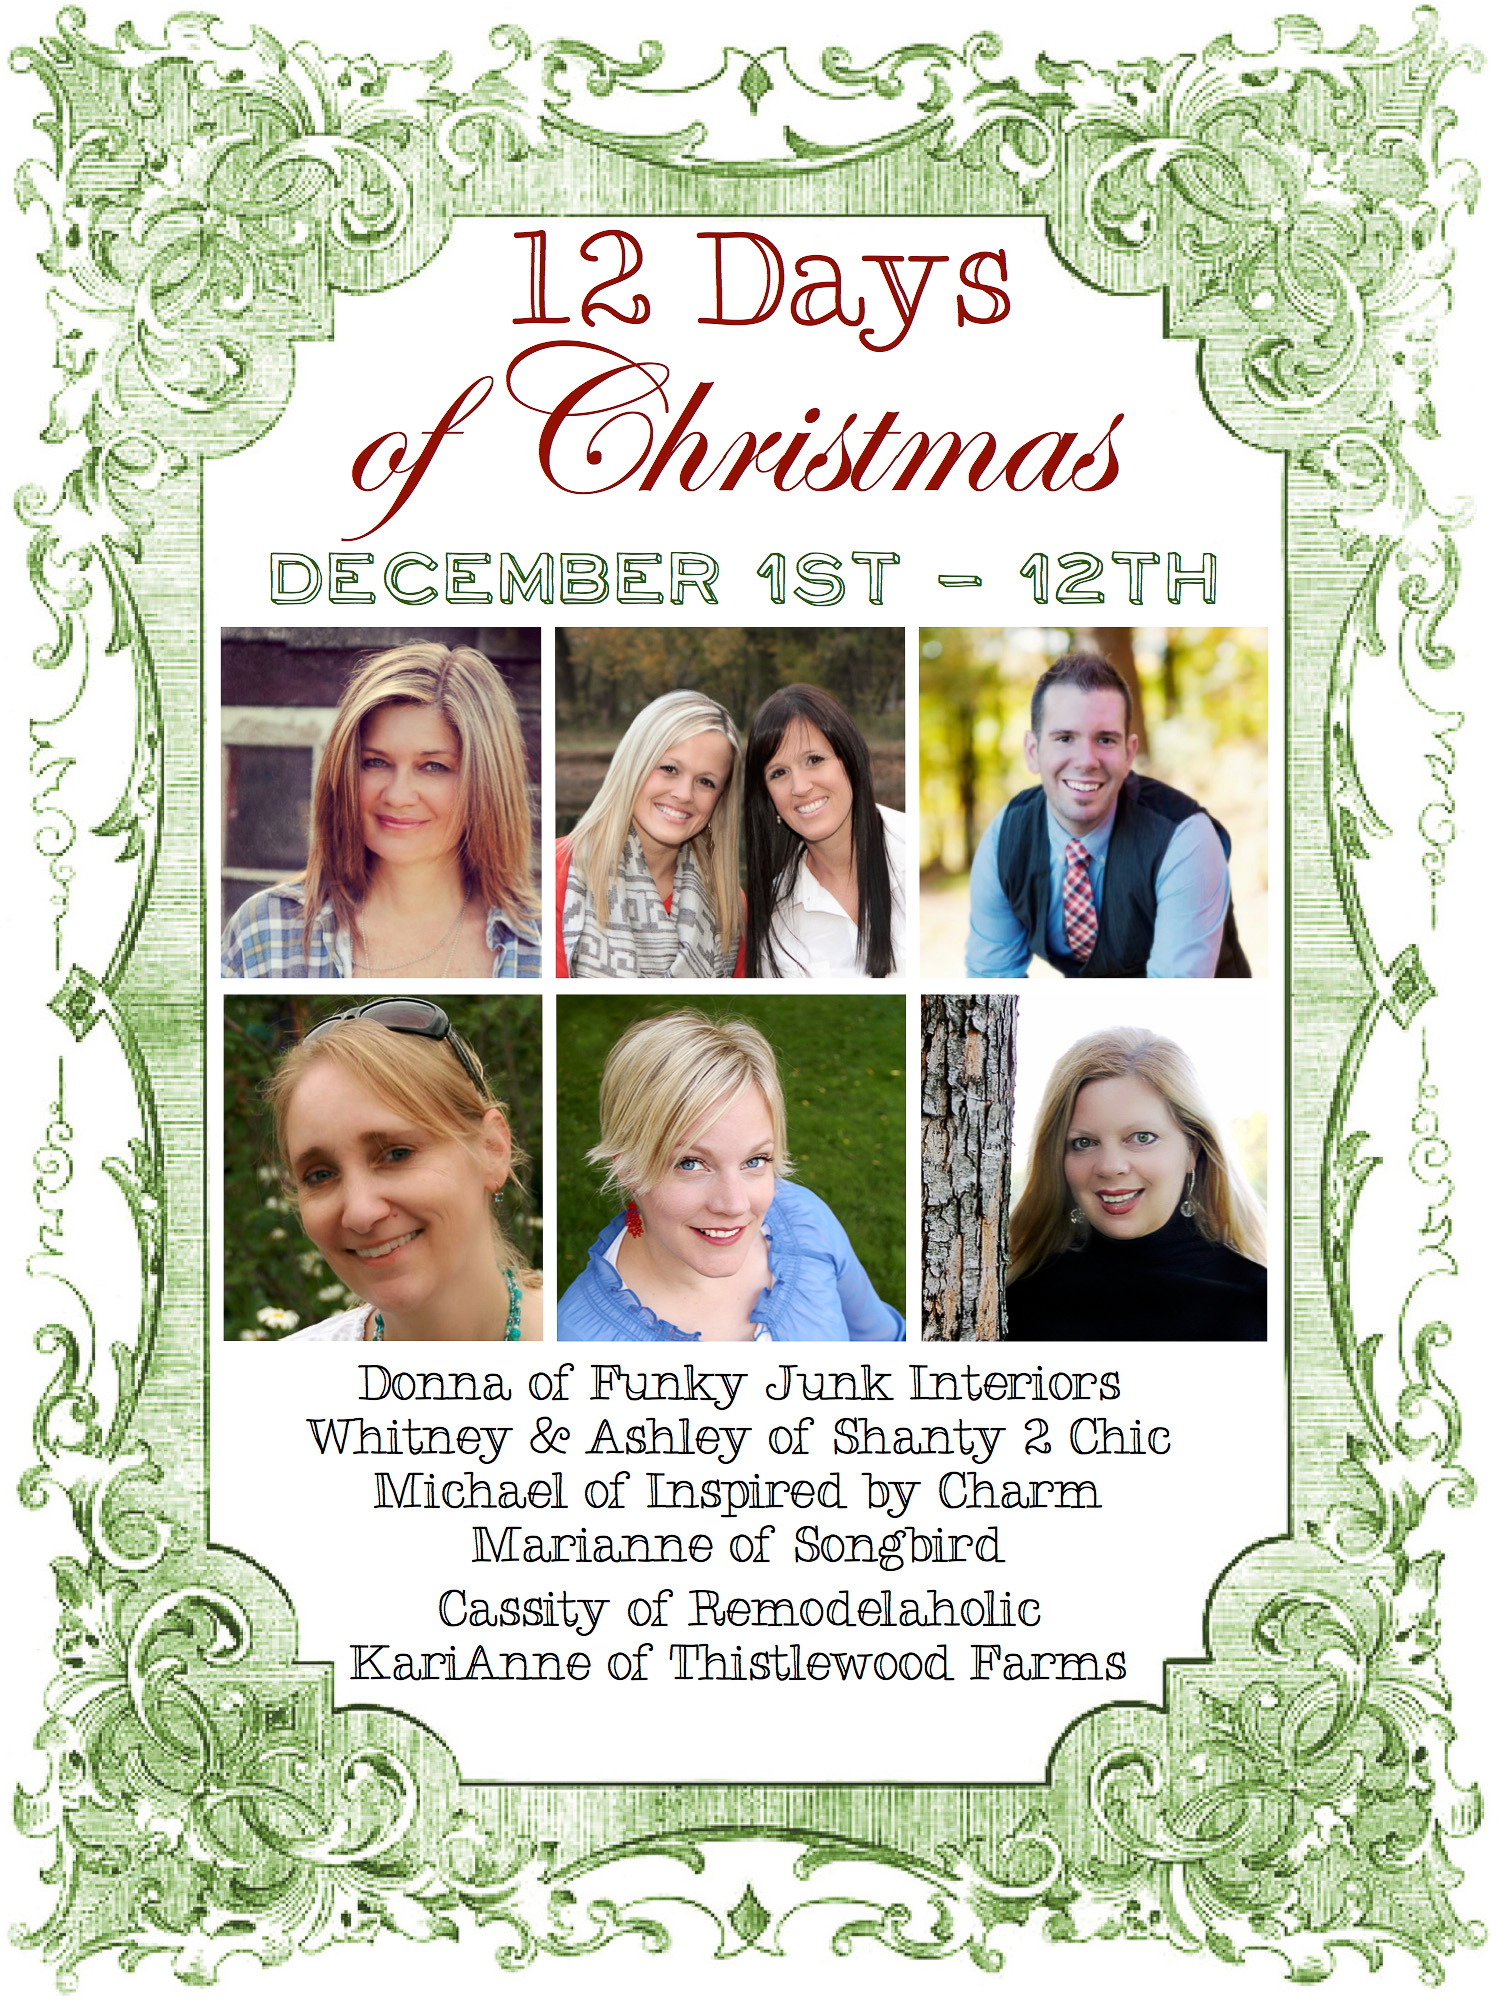 12 Days of Christmas 2013 via https://www.funkyjunkinteriors.net/